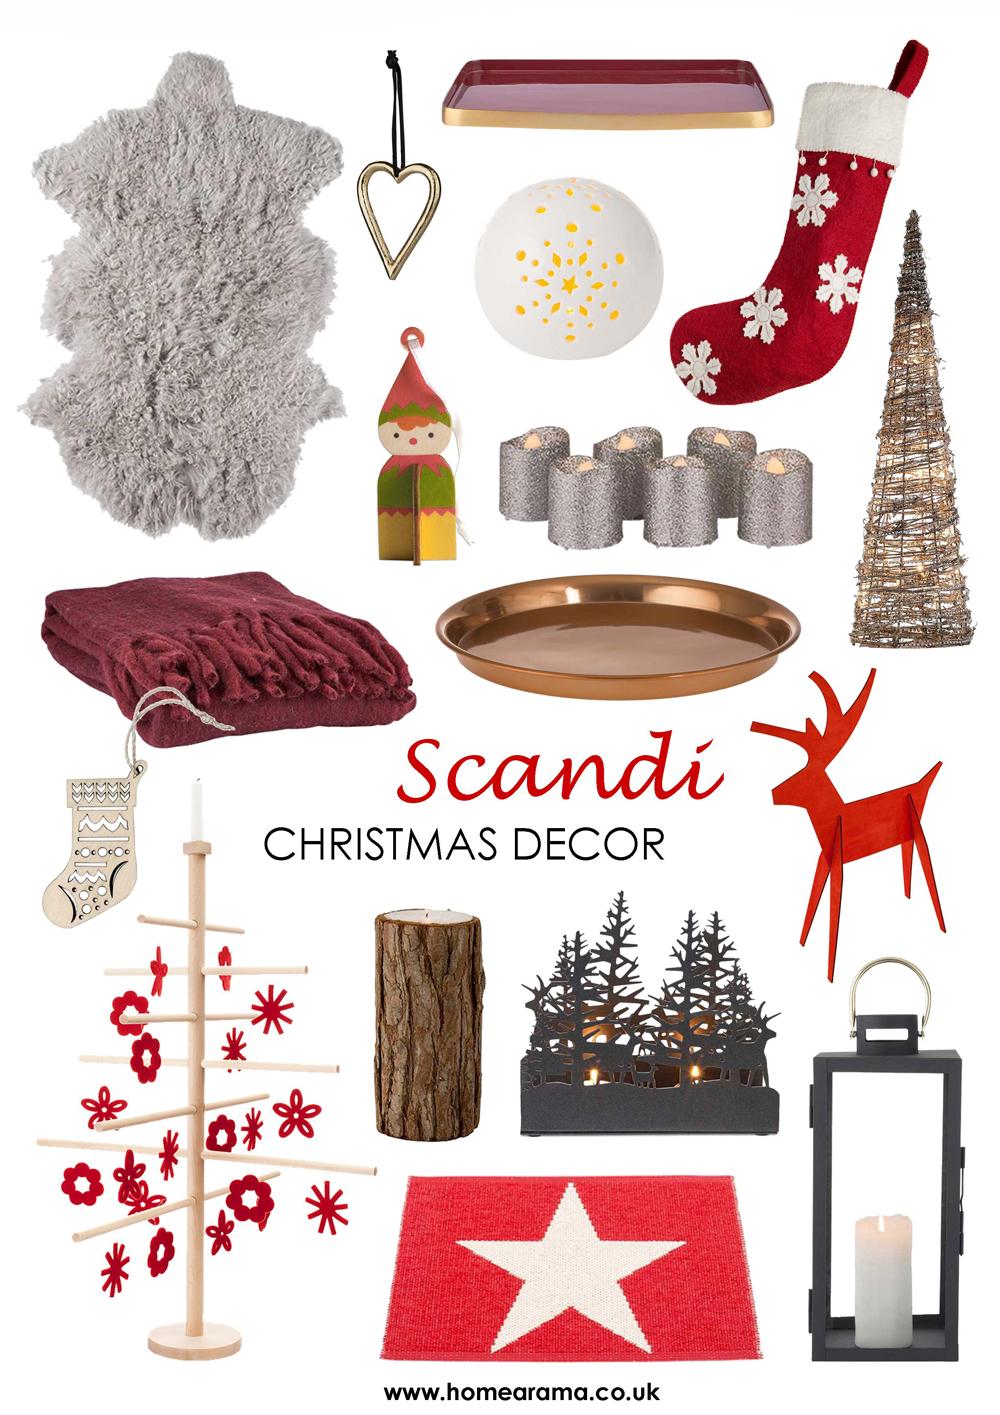 Scandi Christmas Products